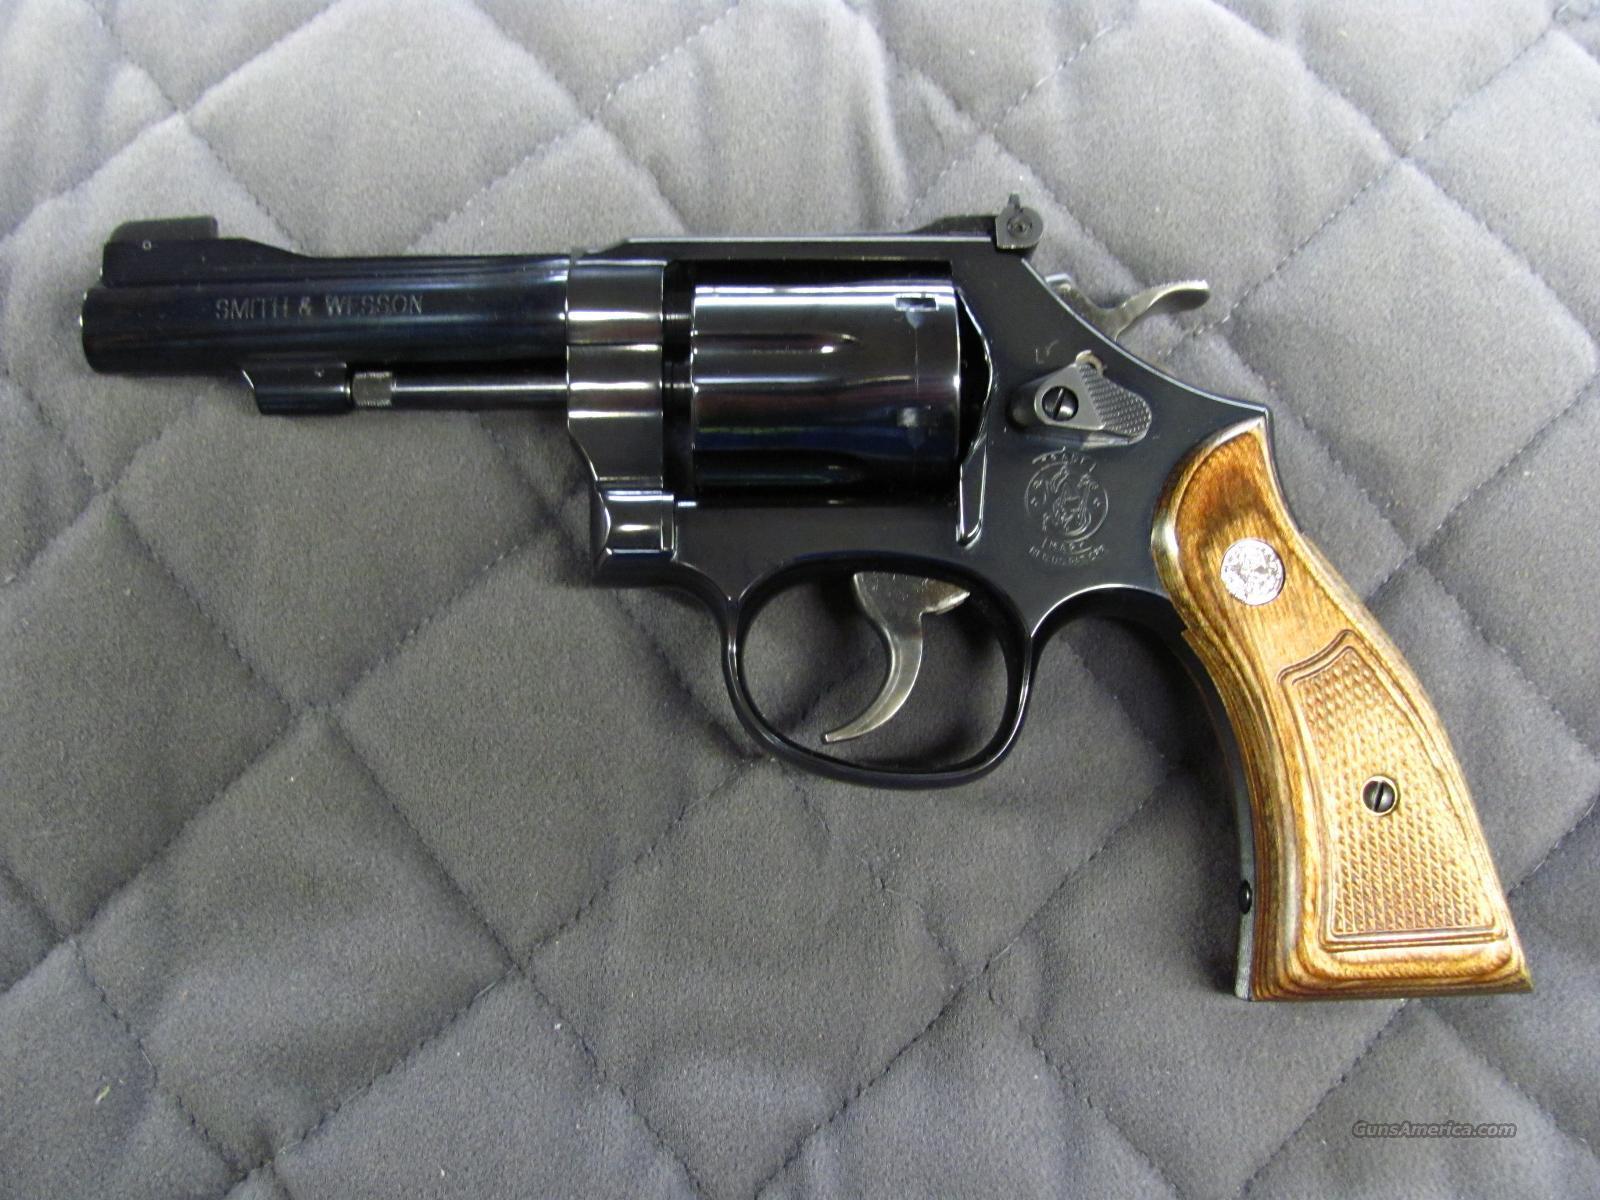 Smith & Wesson Model 18 Combat Masterpiece 22 LR  **NEW**  Guns > Pistols > Smith & Wesson Revolvers > Full Frame Revolver